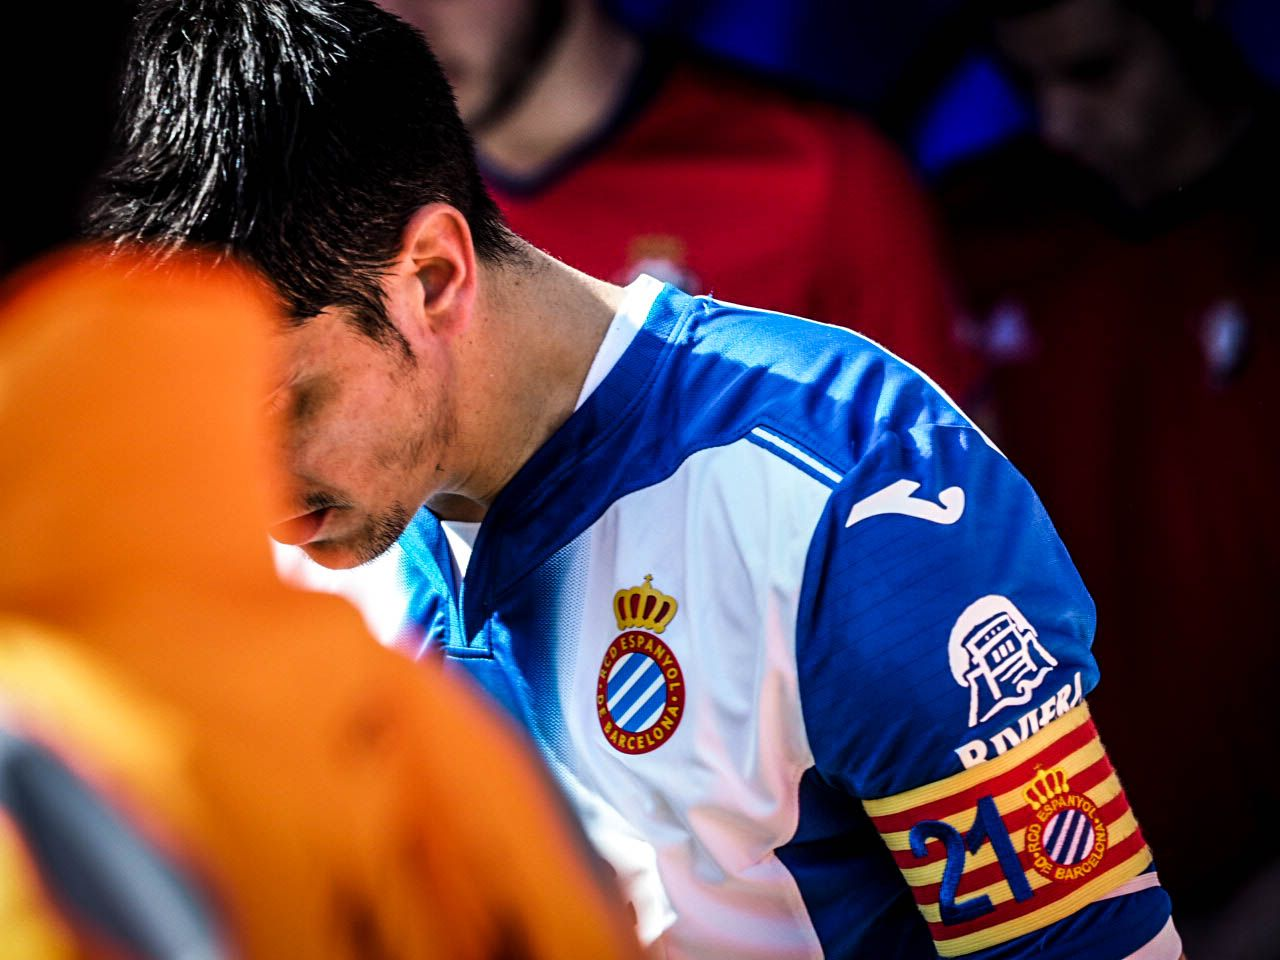 @Espanyol #GerardMoreno #RCDE #EspanyolOsasuna #Pericosen9s #9ine